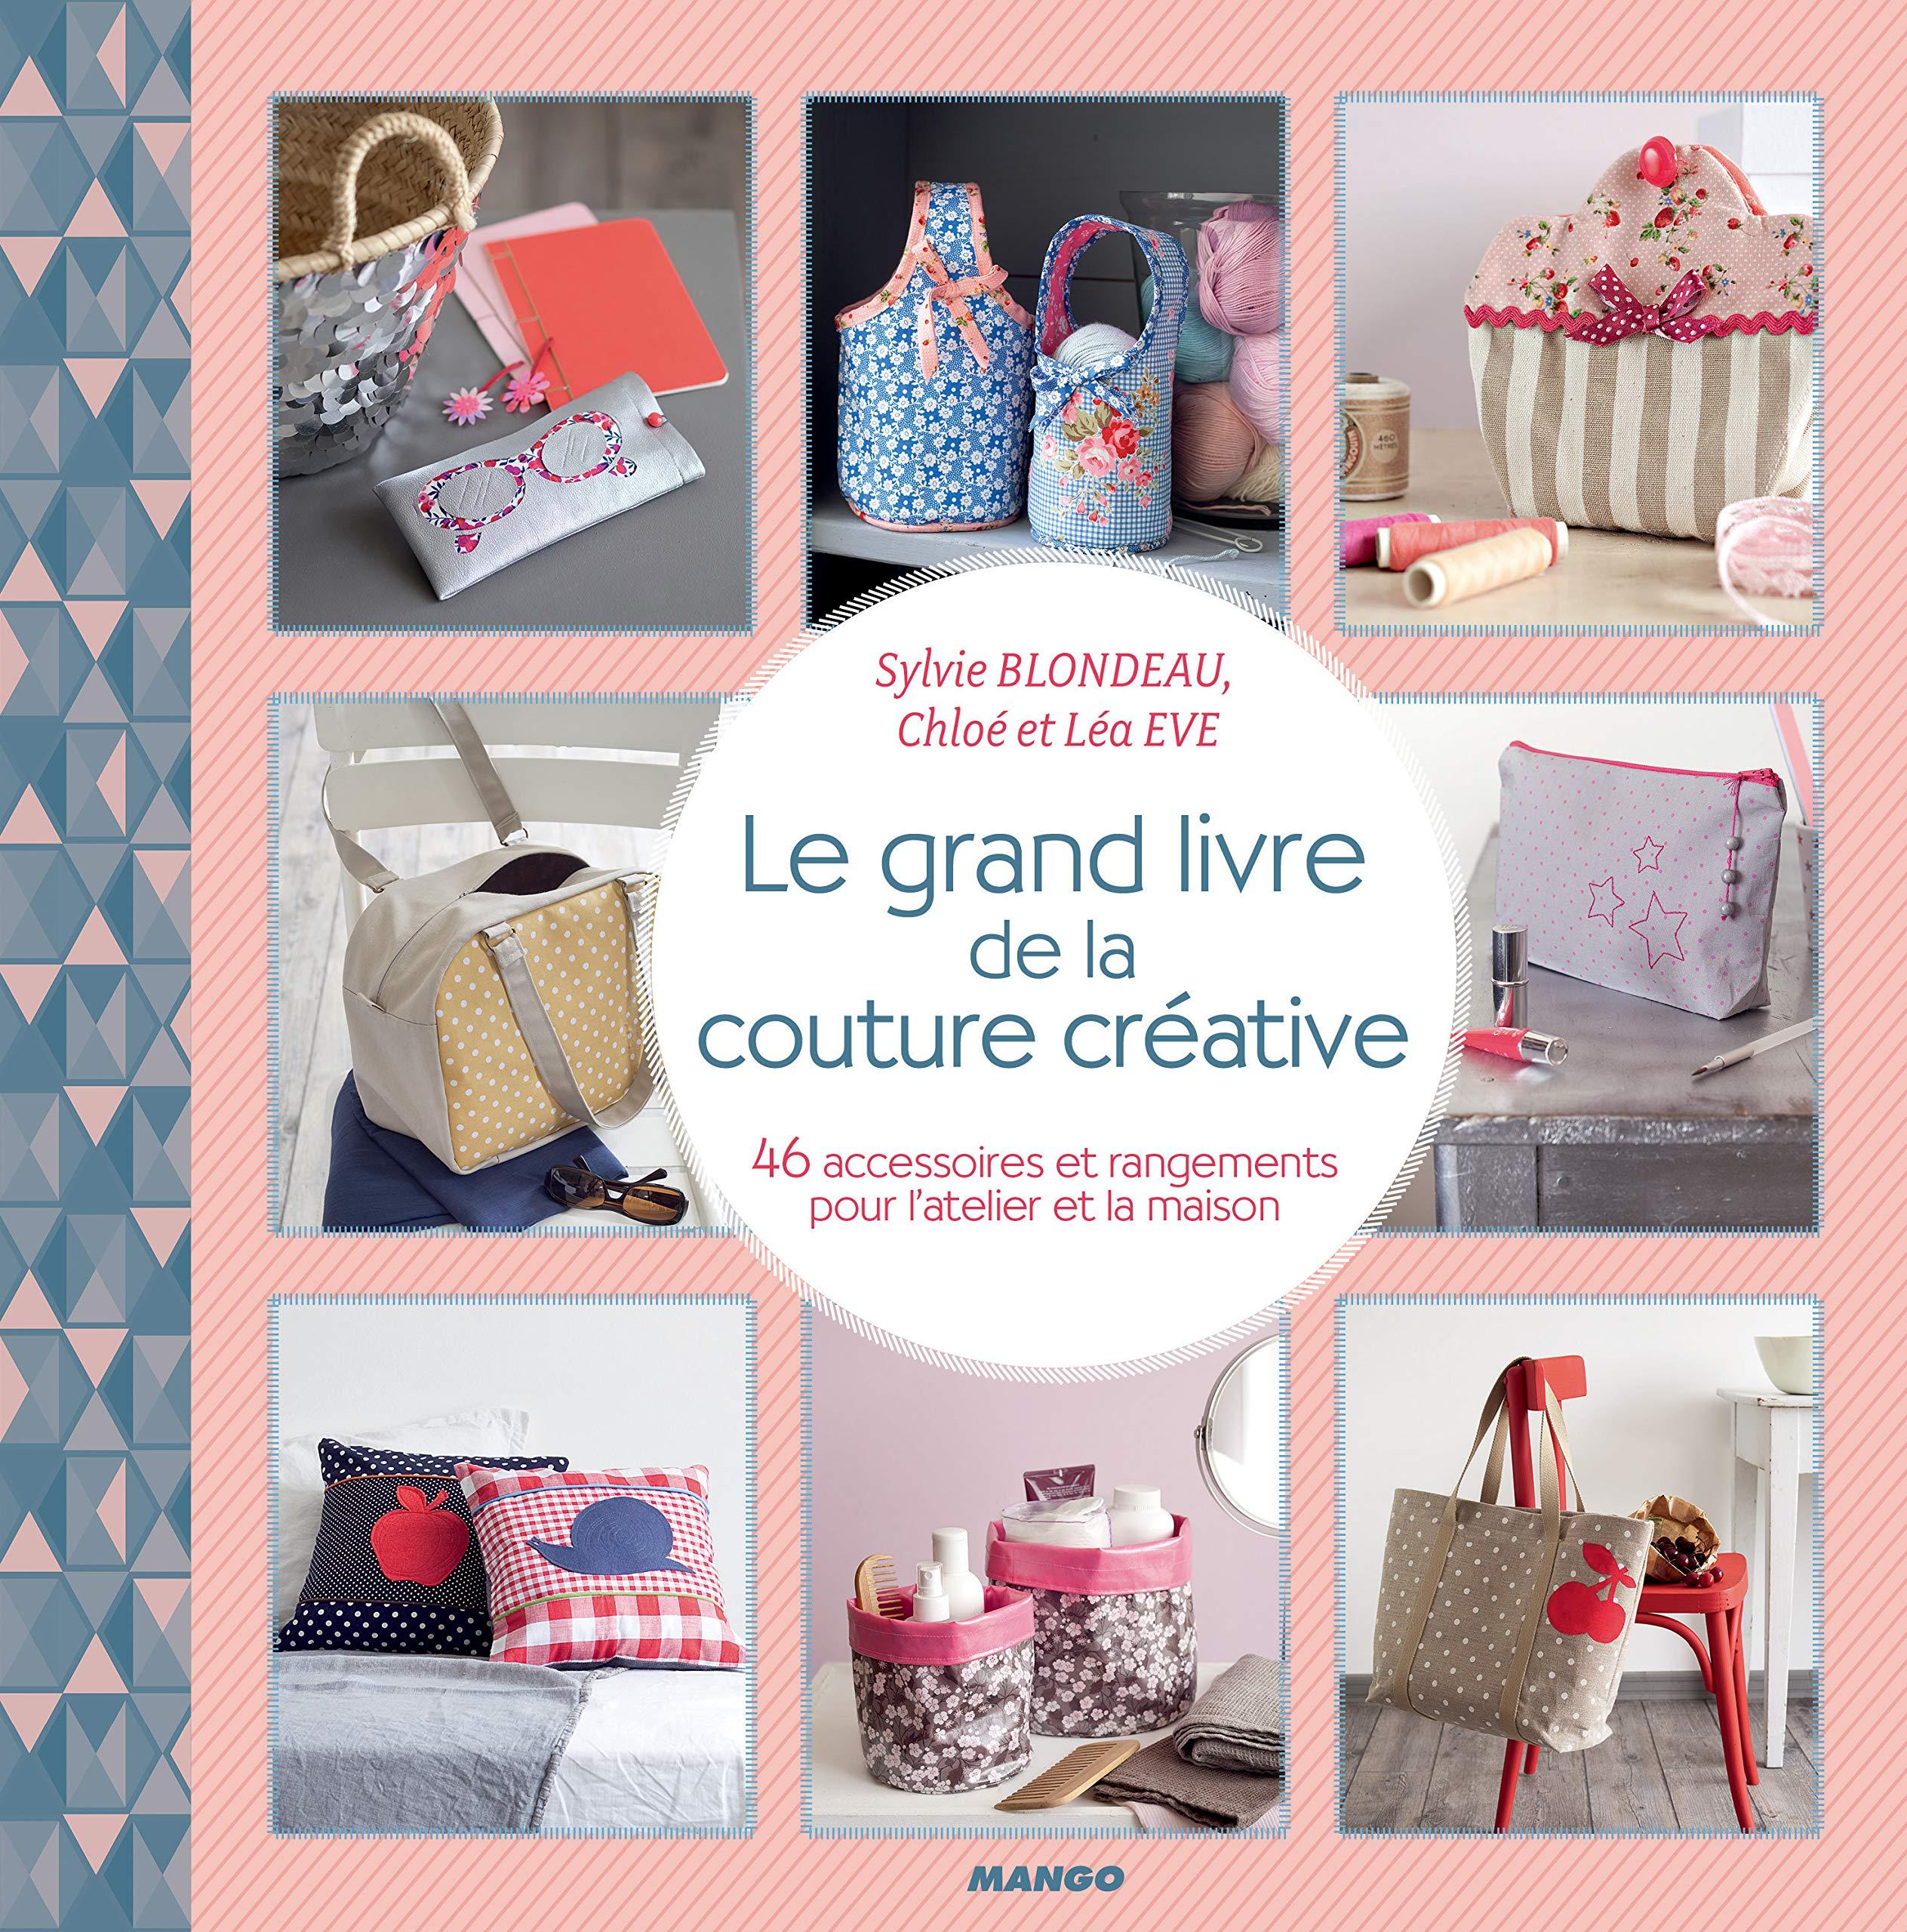 Le Grand Livre De La Couture Creative Couture Creative French Edition Blondeau Sylvie Eve Chloe Eve Lea 9782812503207 Amazon Com Books